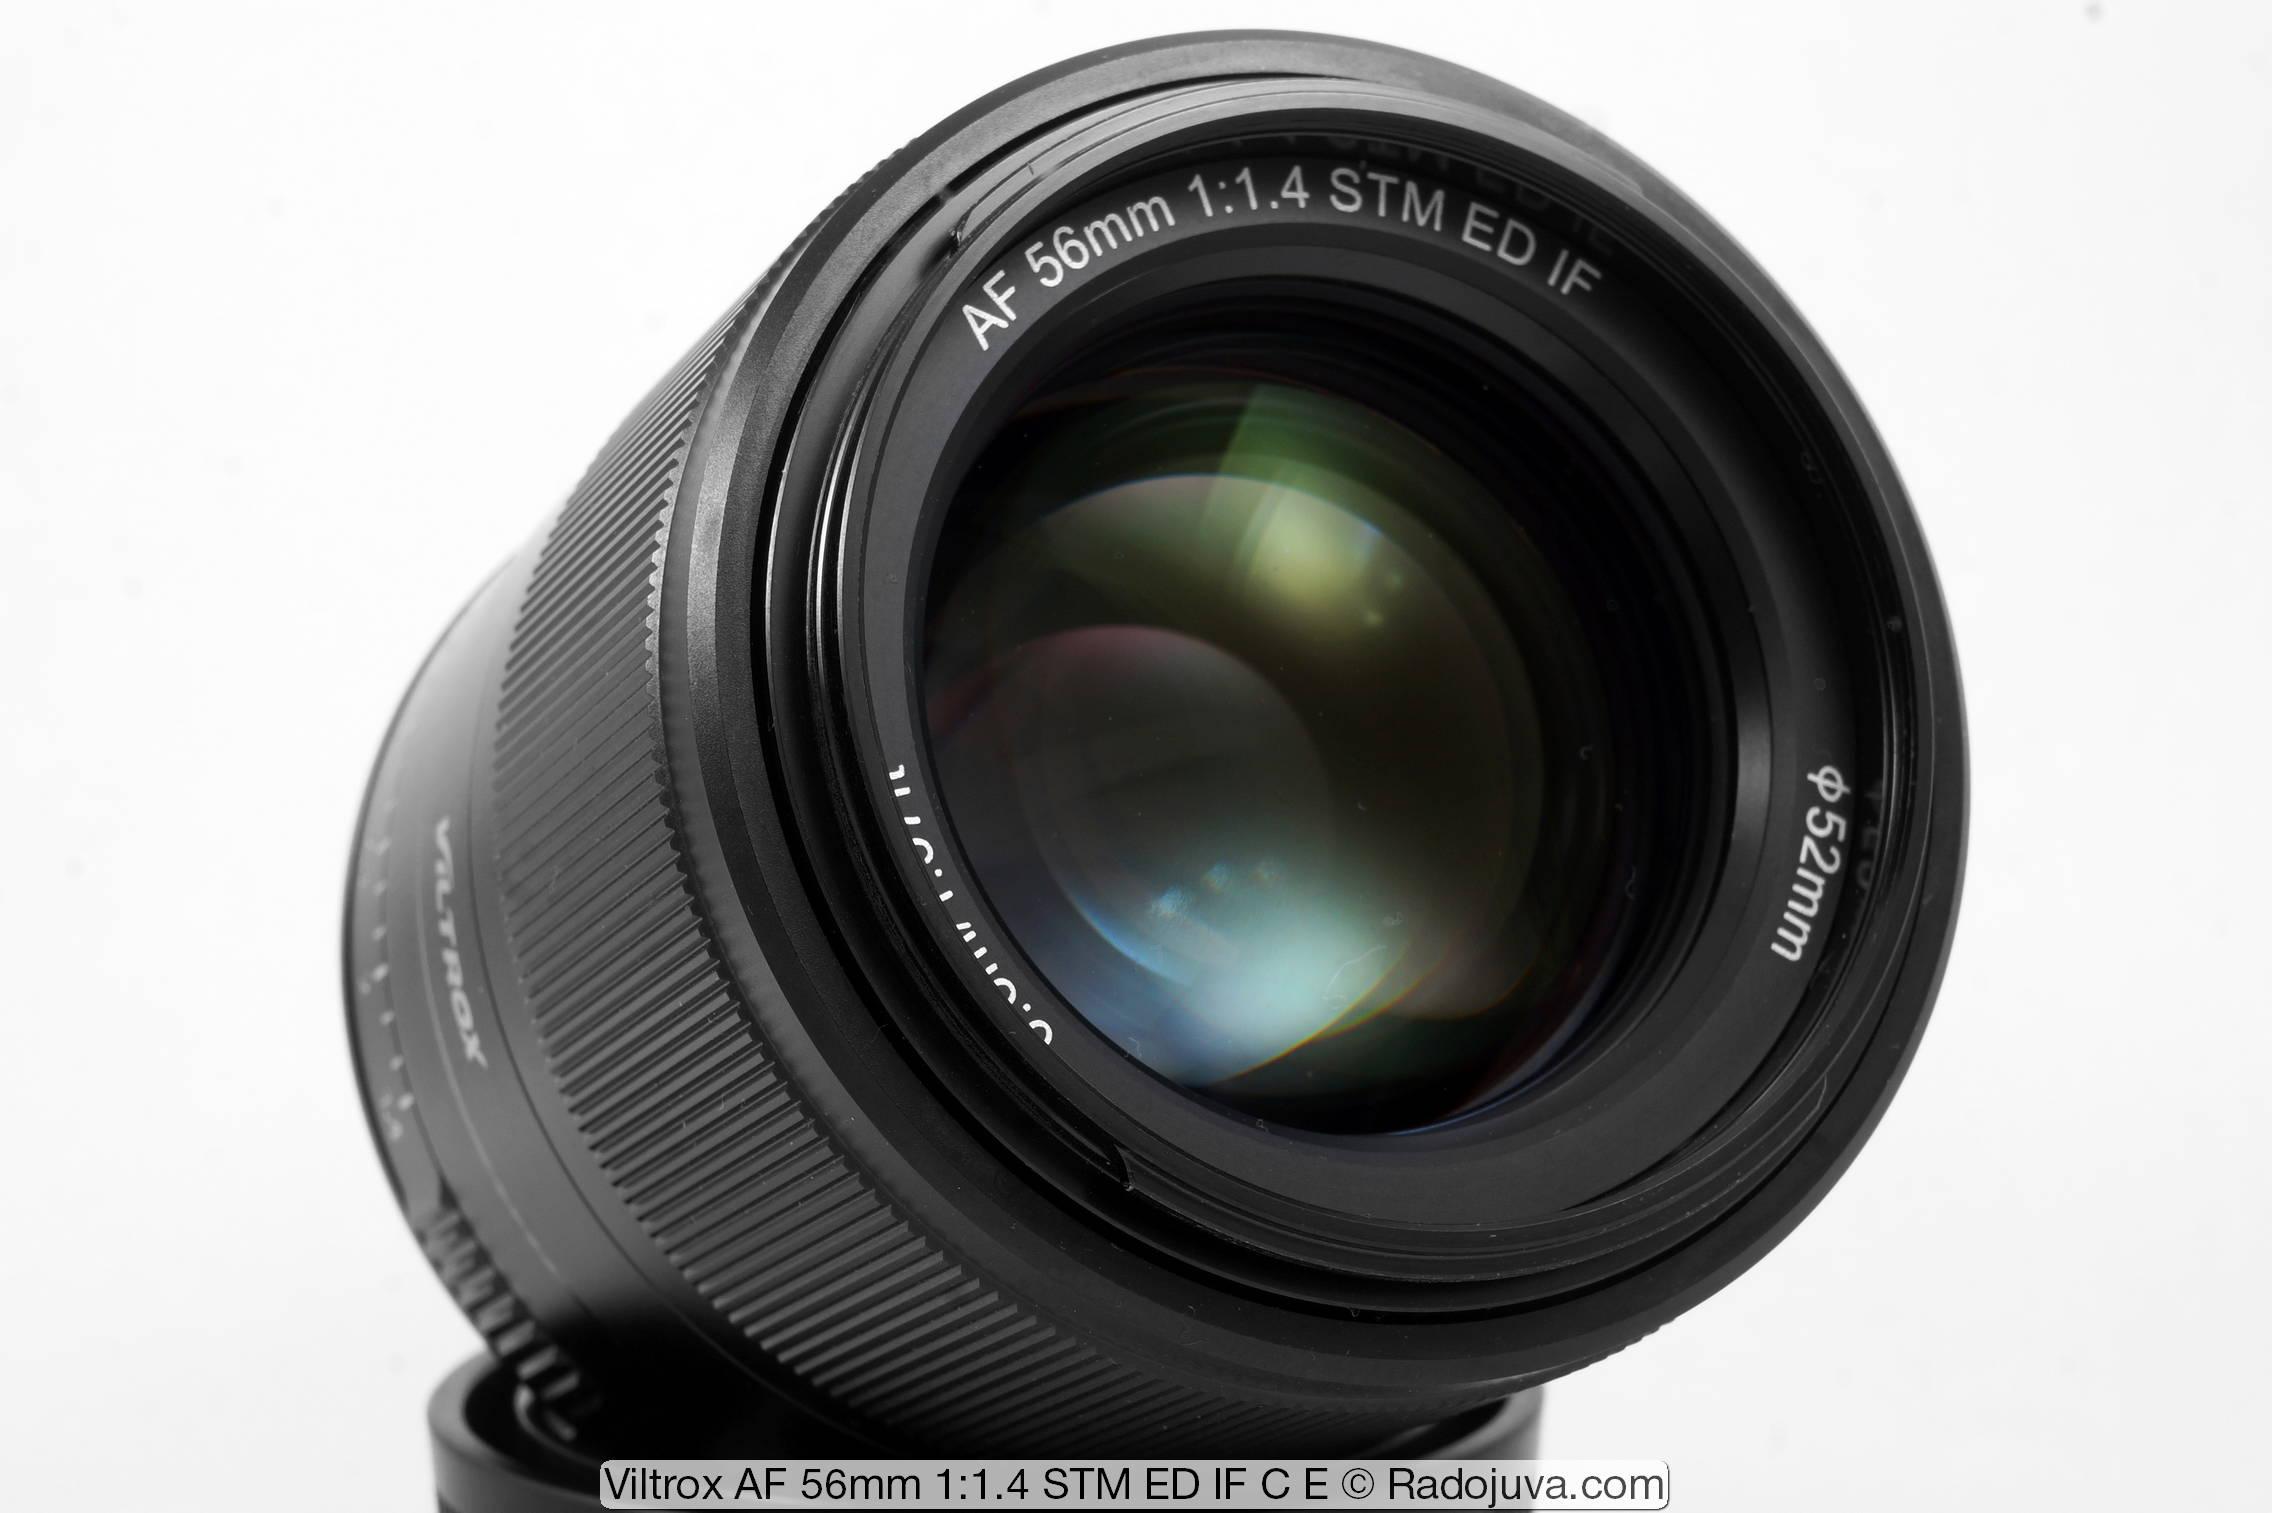 Viltrox AF 56mm 1:1.4 STM ED IF C E под байонет Sony E-mount